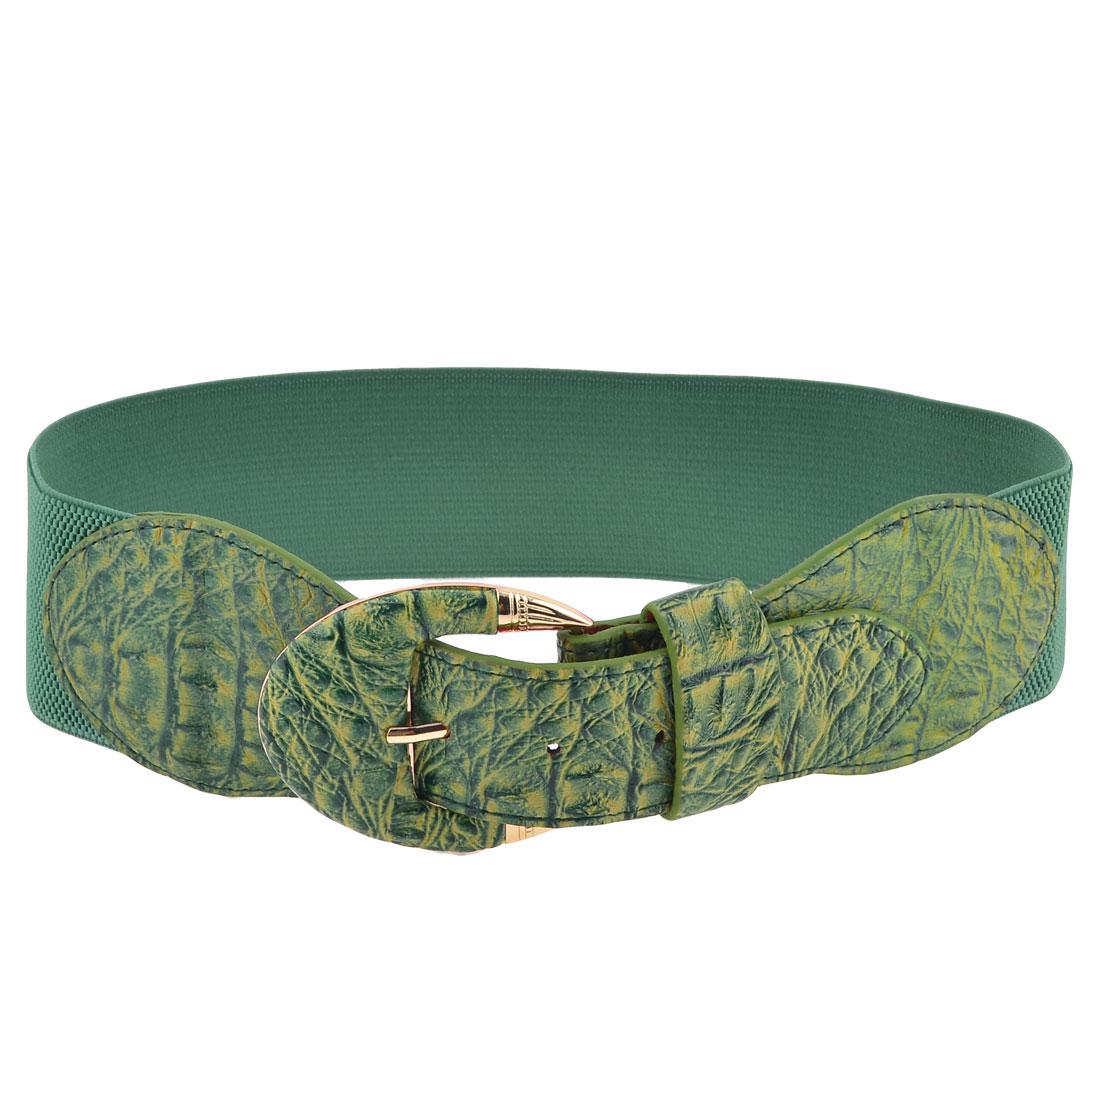 Lady Single Pin Buckle Faux Leather 6cm Wide Elastic Waist Cinch Belt Green